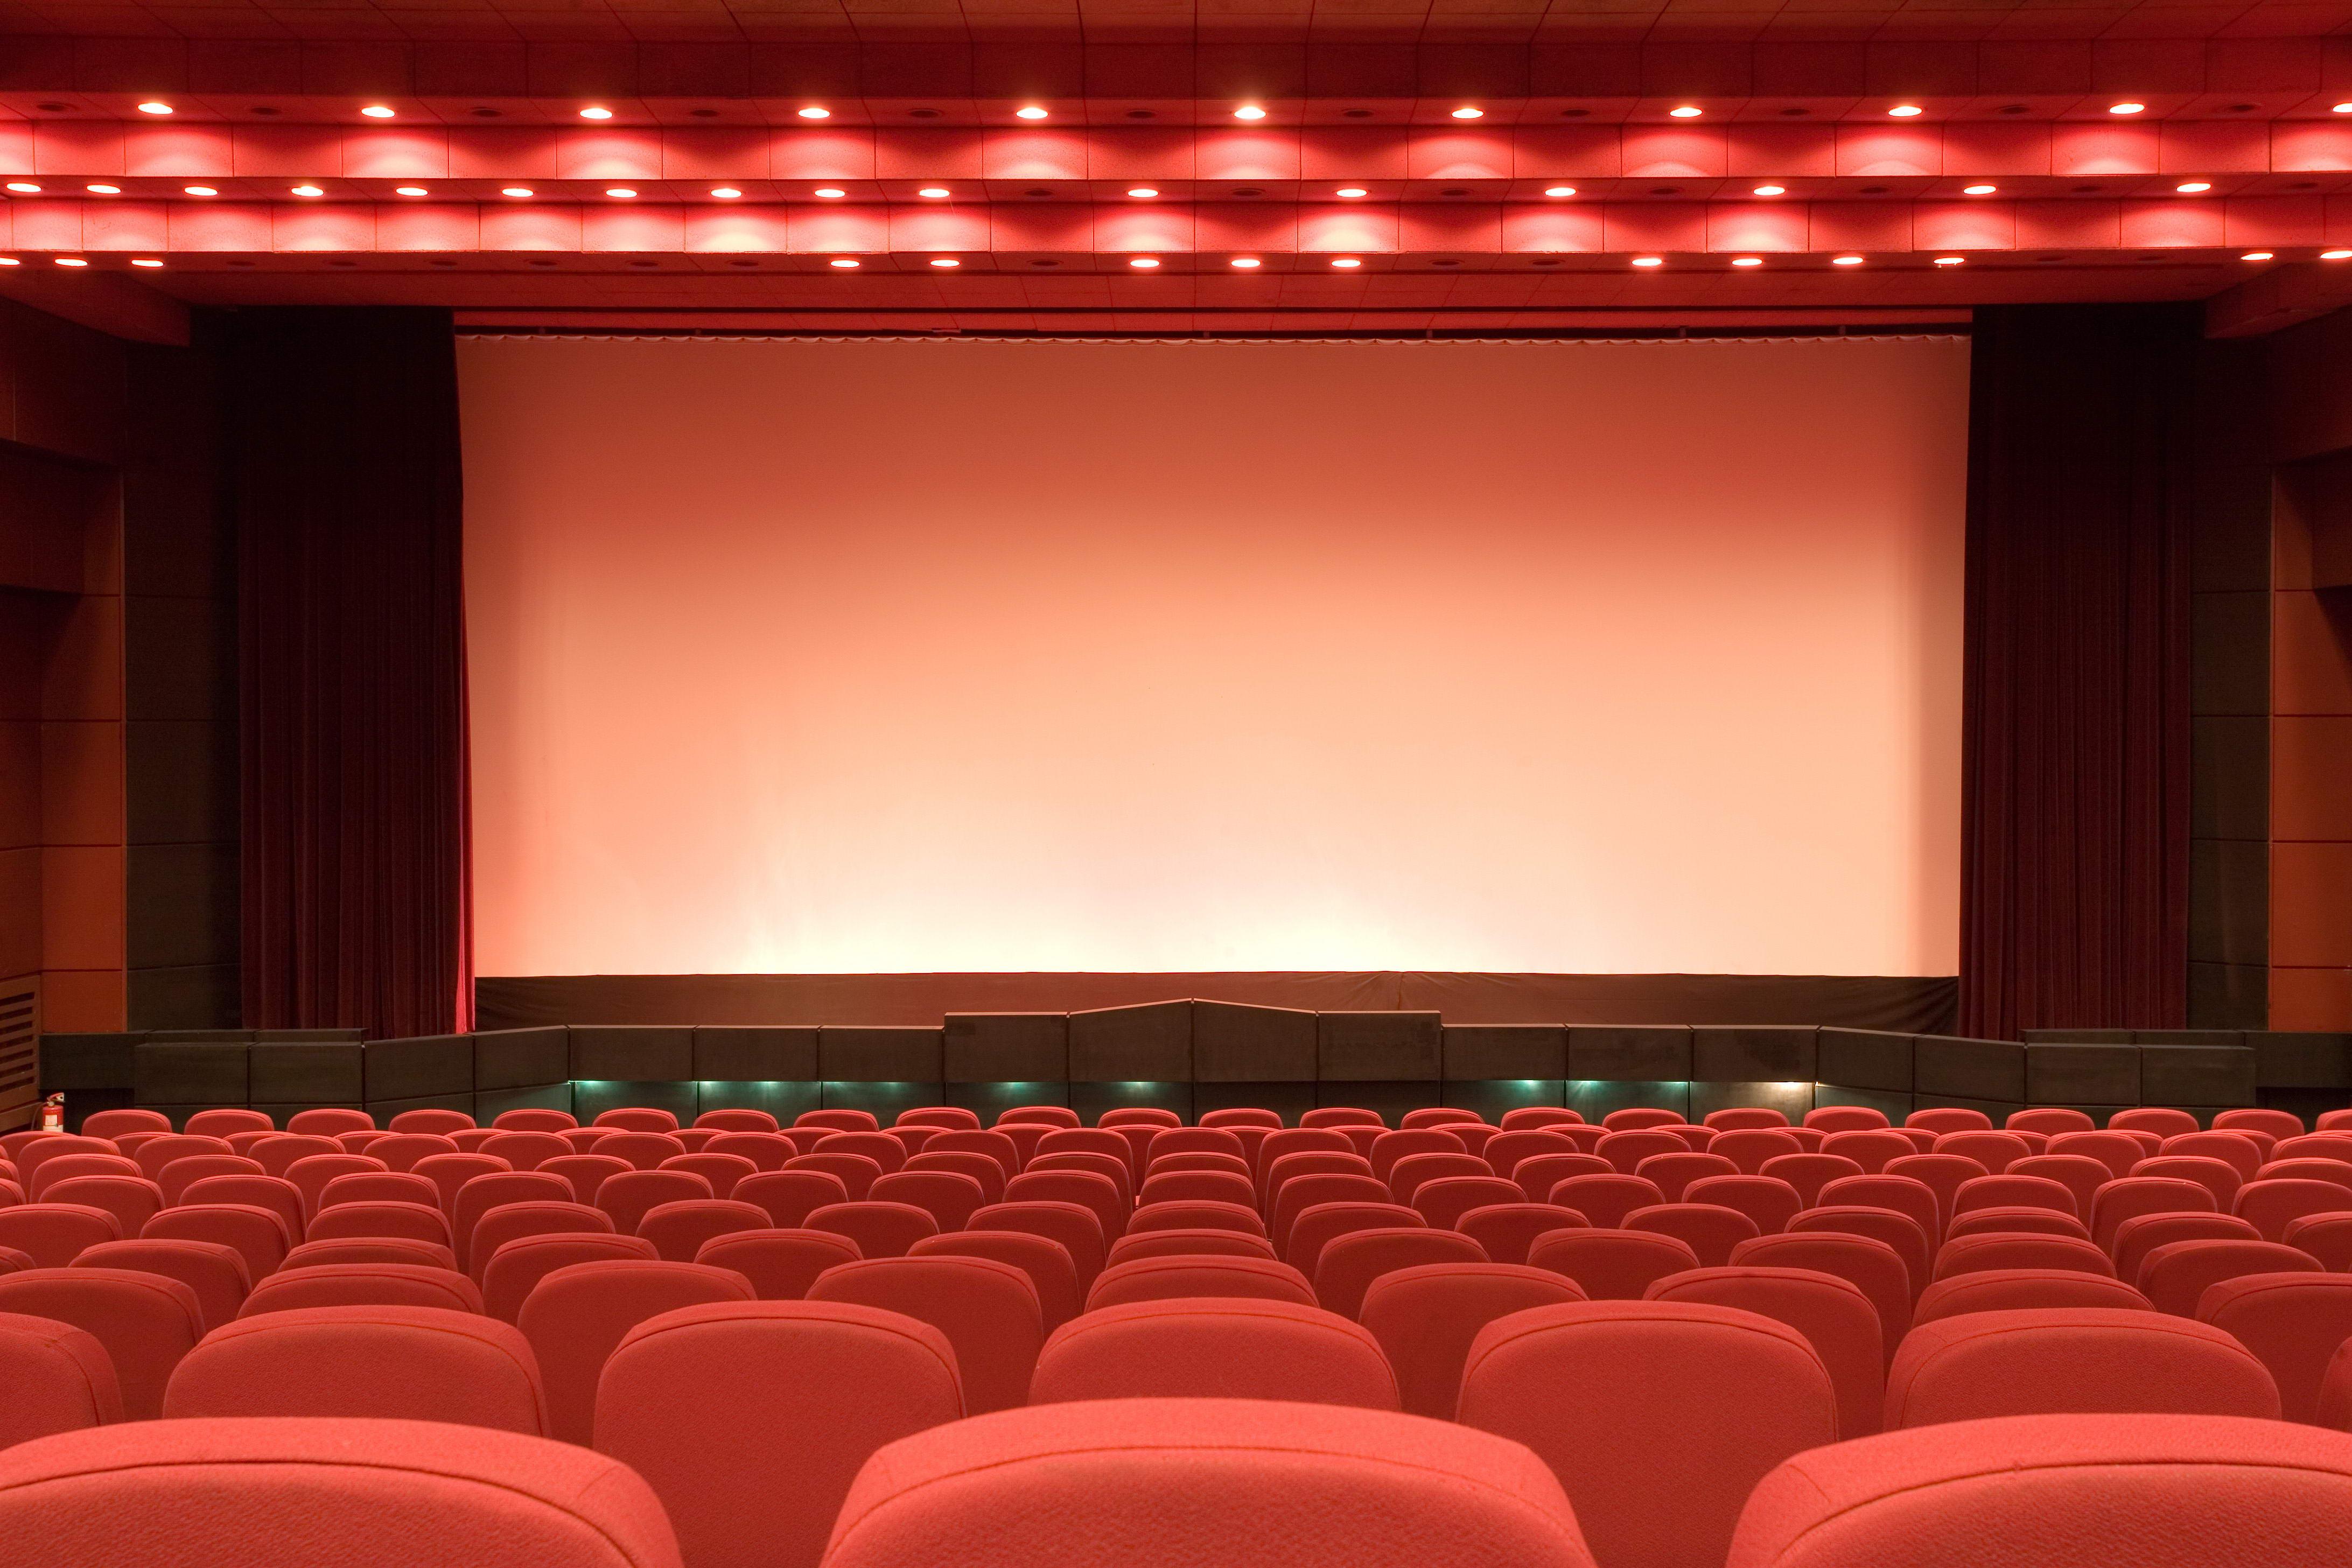 Билет на концерт, в кино или театр